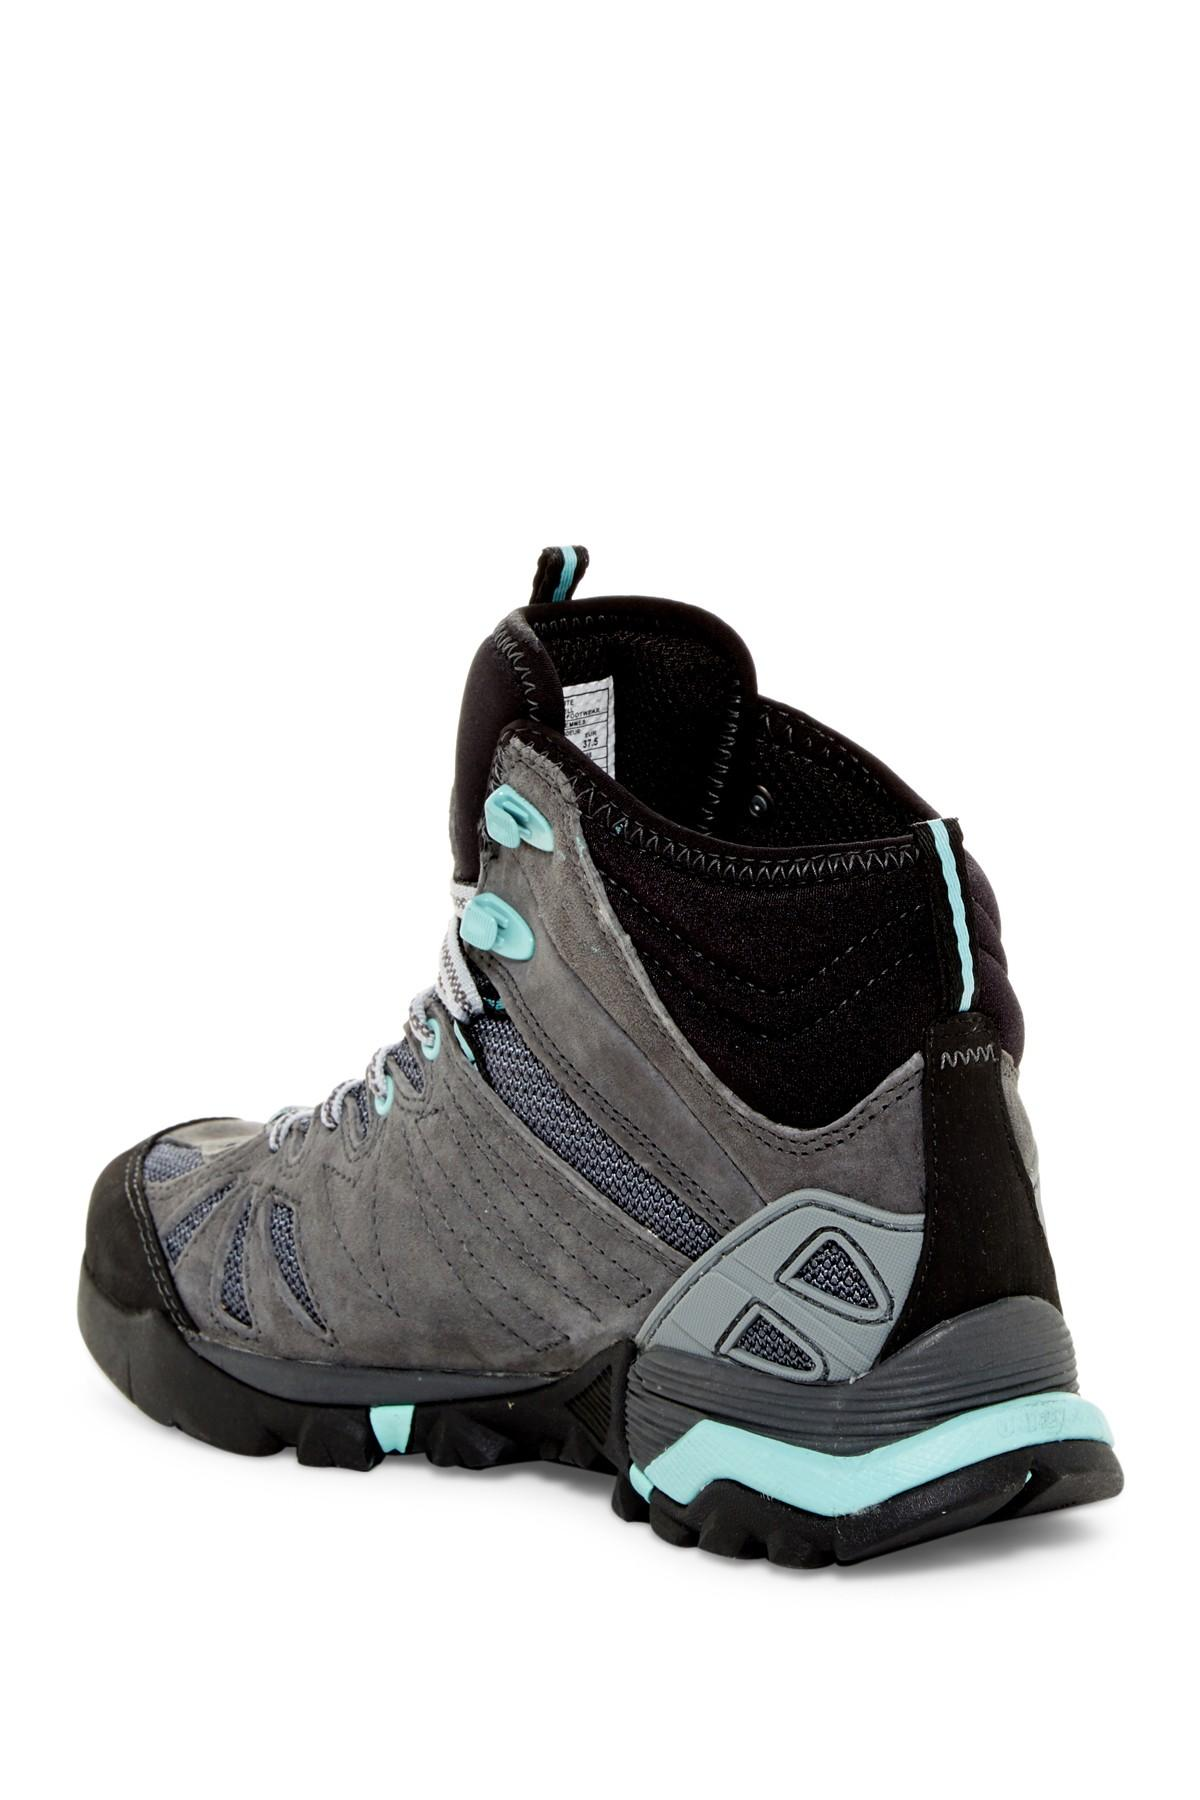 Lyst Merrell Capra Mid Waterproof Hiking Boot In Black